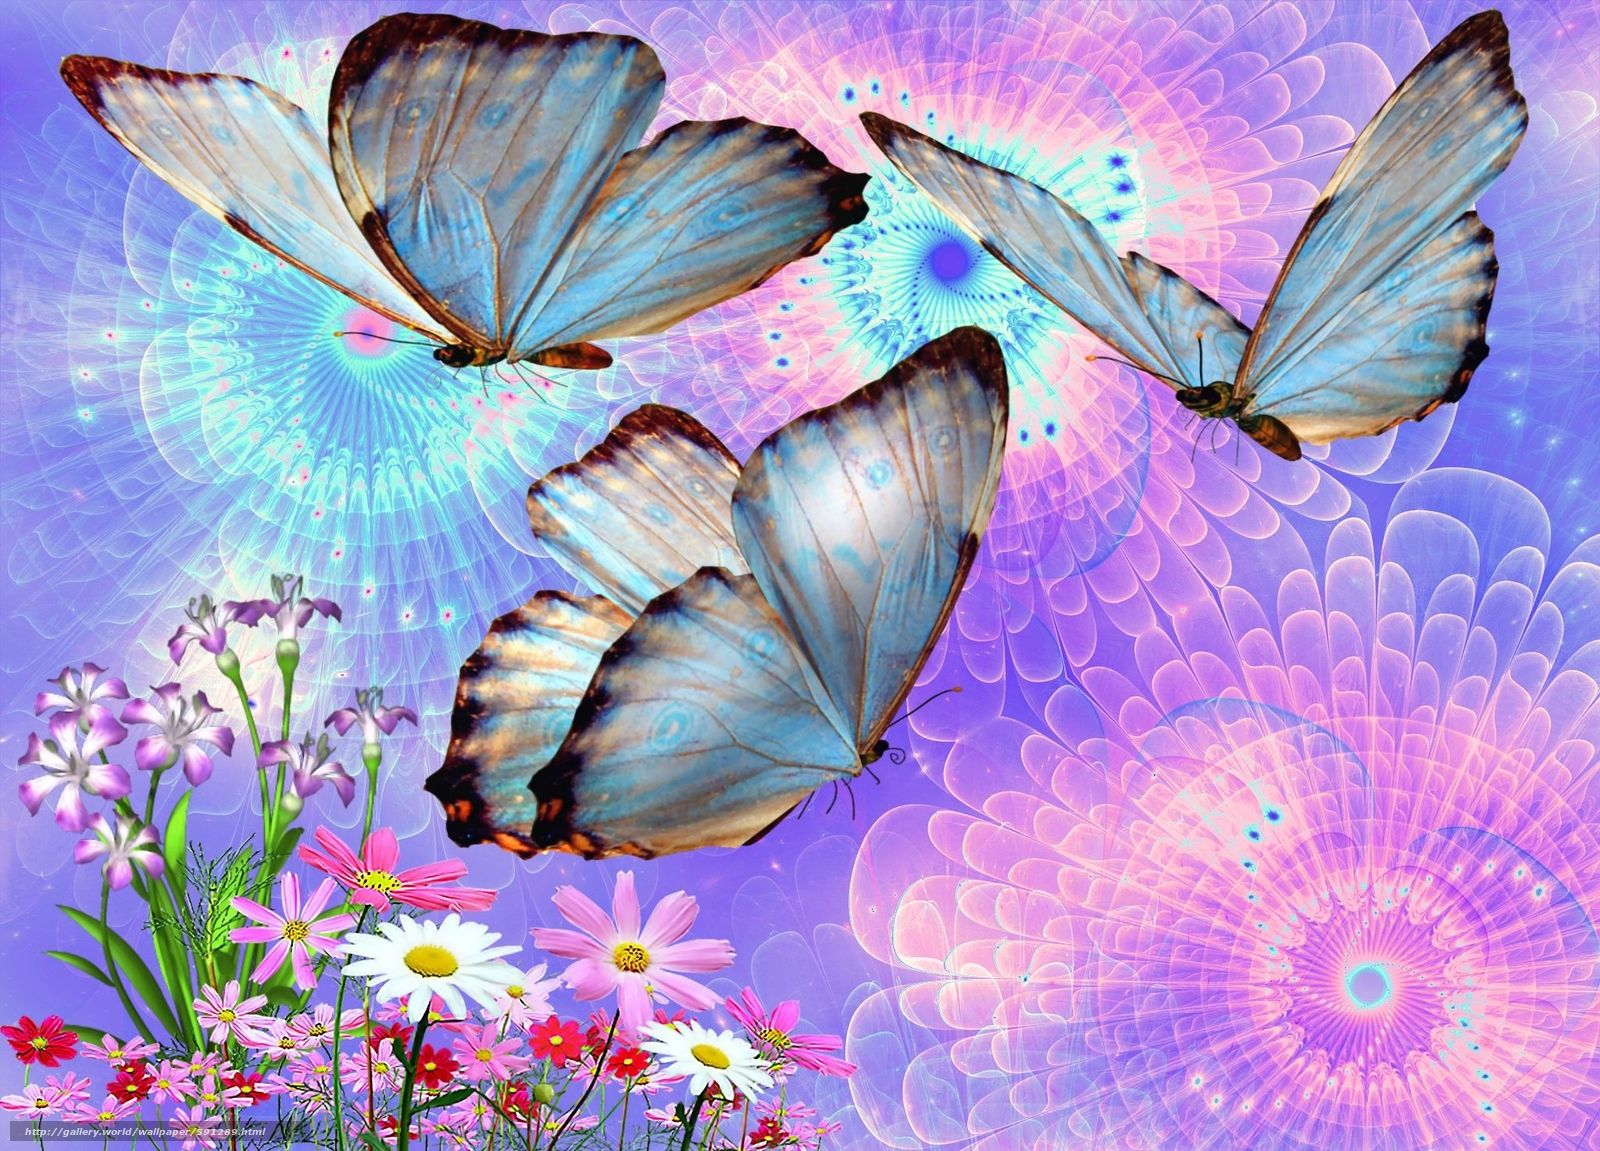 Fondos De Escritorio Gratis: Descargar Gratis Mariposas, Flores, 3d, Arte Fondos De